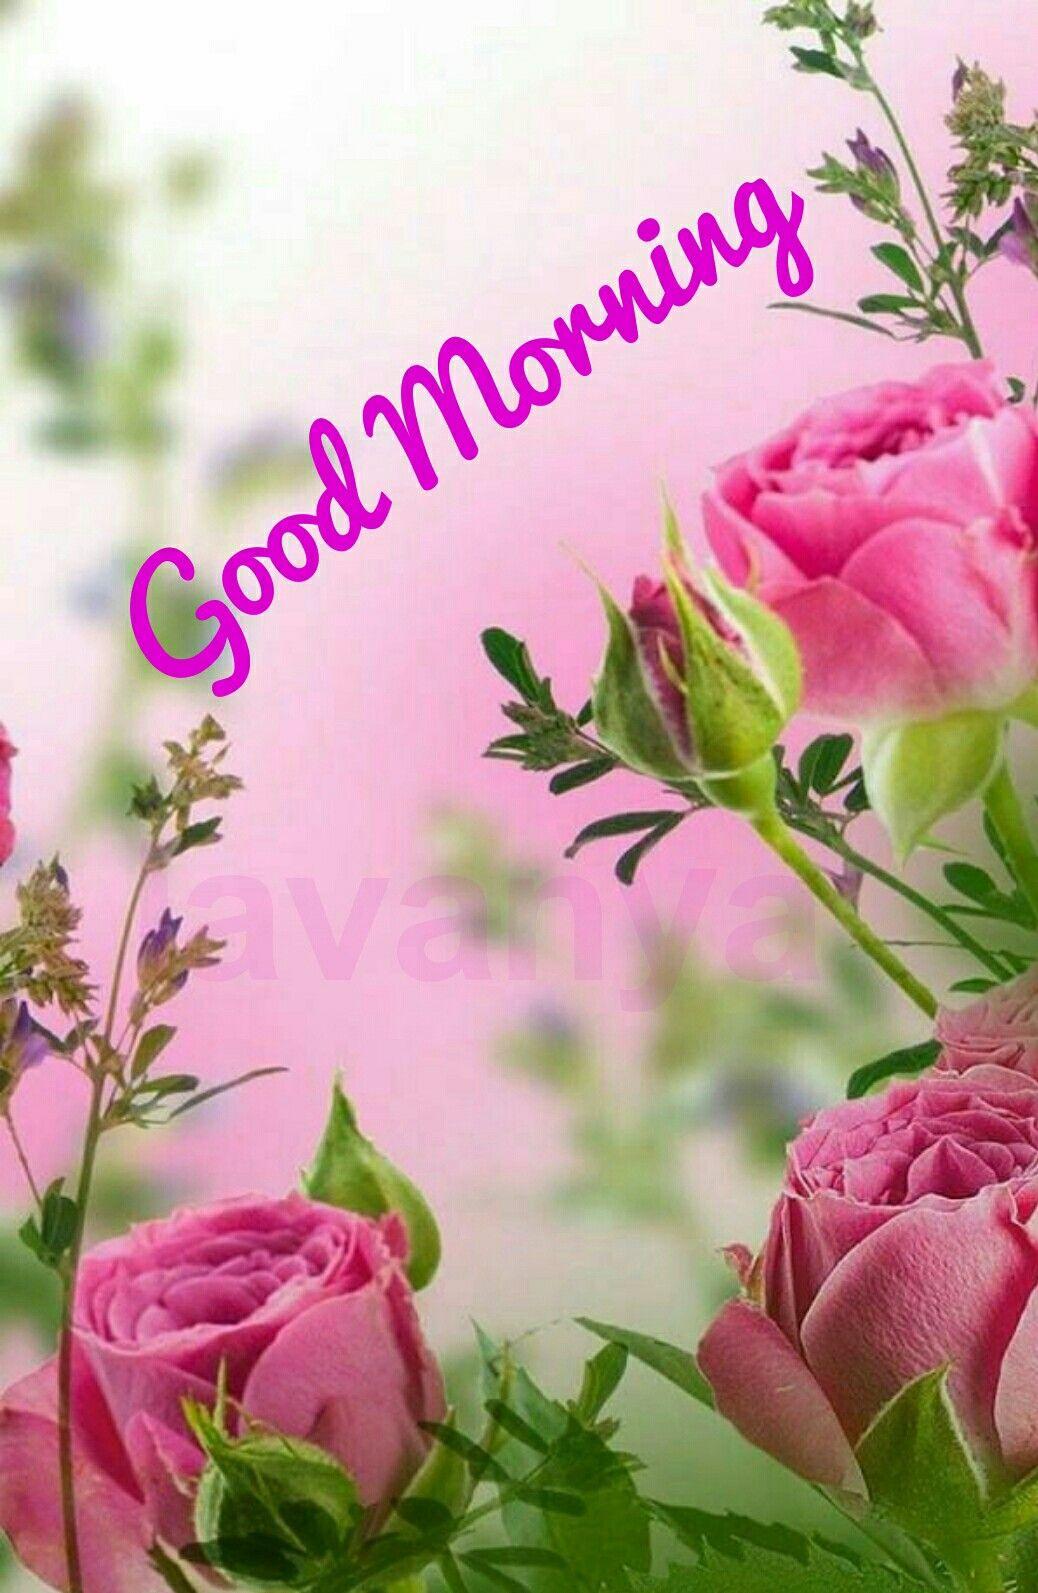 Pretty flowers image by Lavanya on Good Morning